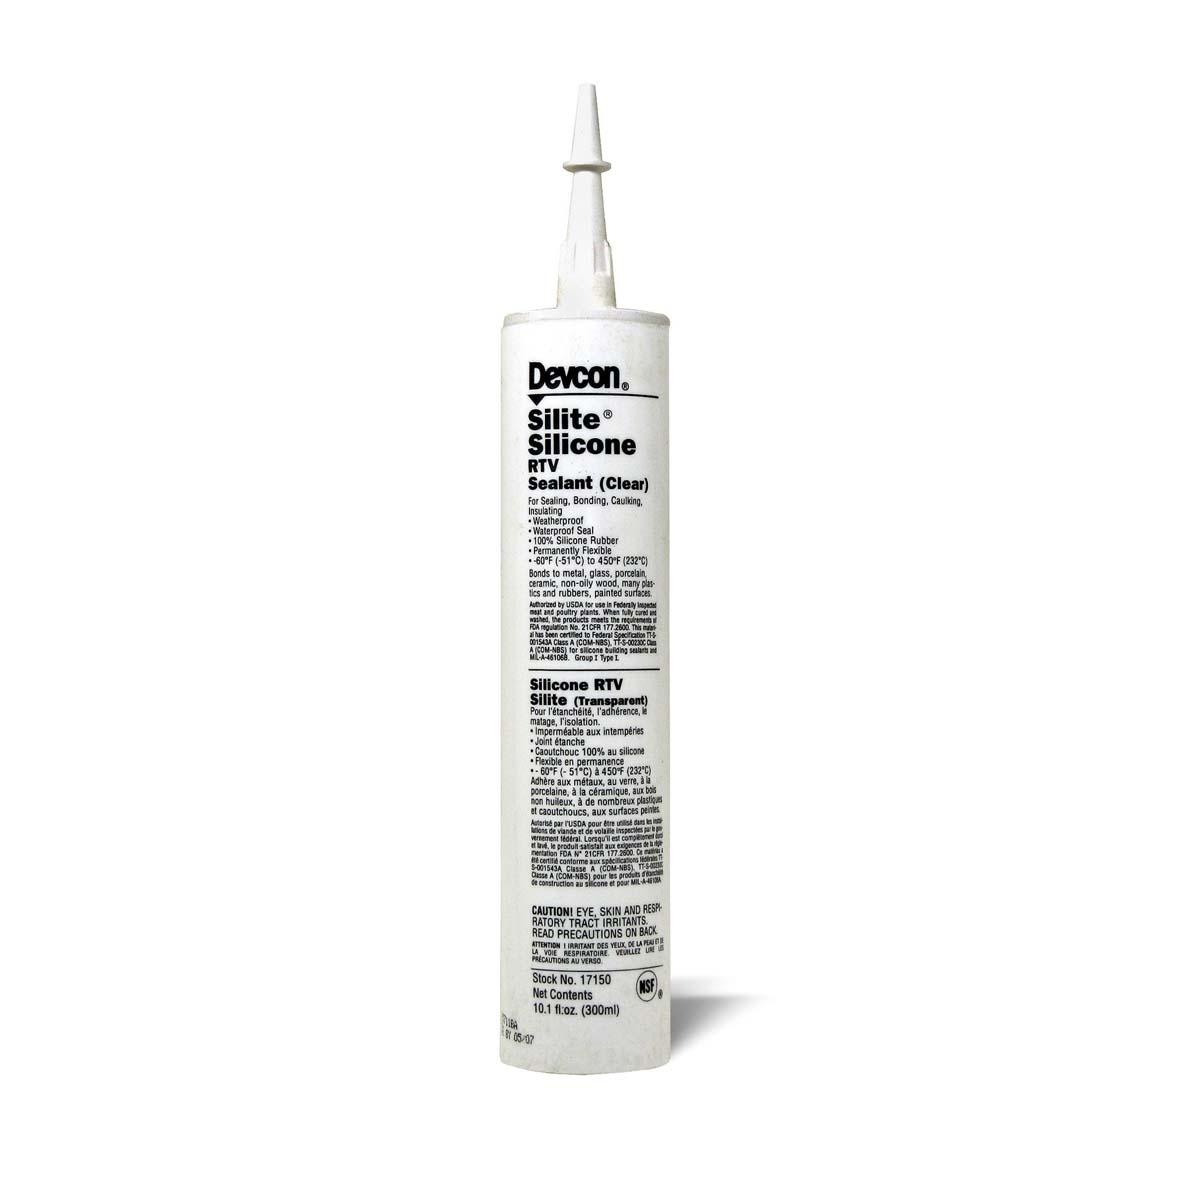 DEVCON® Silite® RTV Silicone* clear - 10.3 fl oz  1 Eac